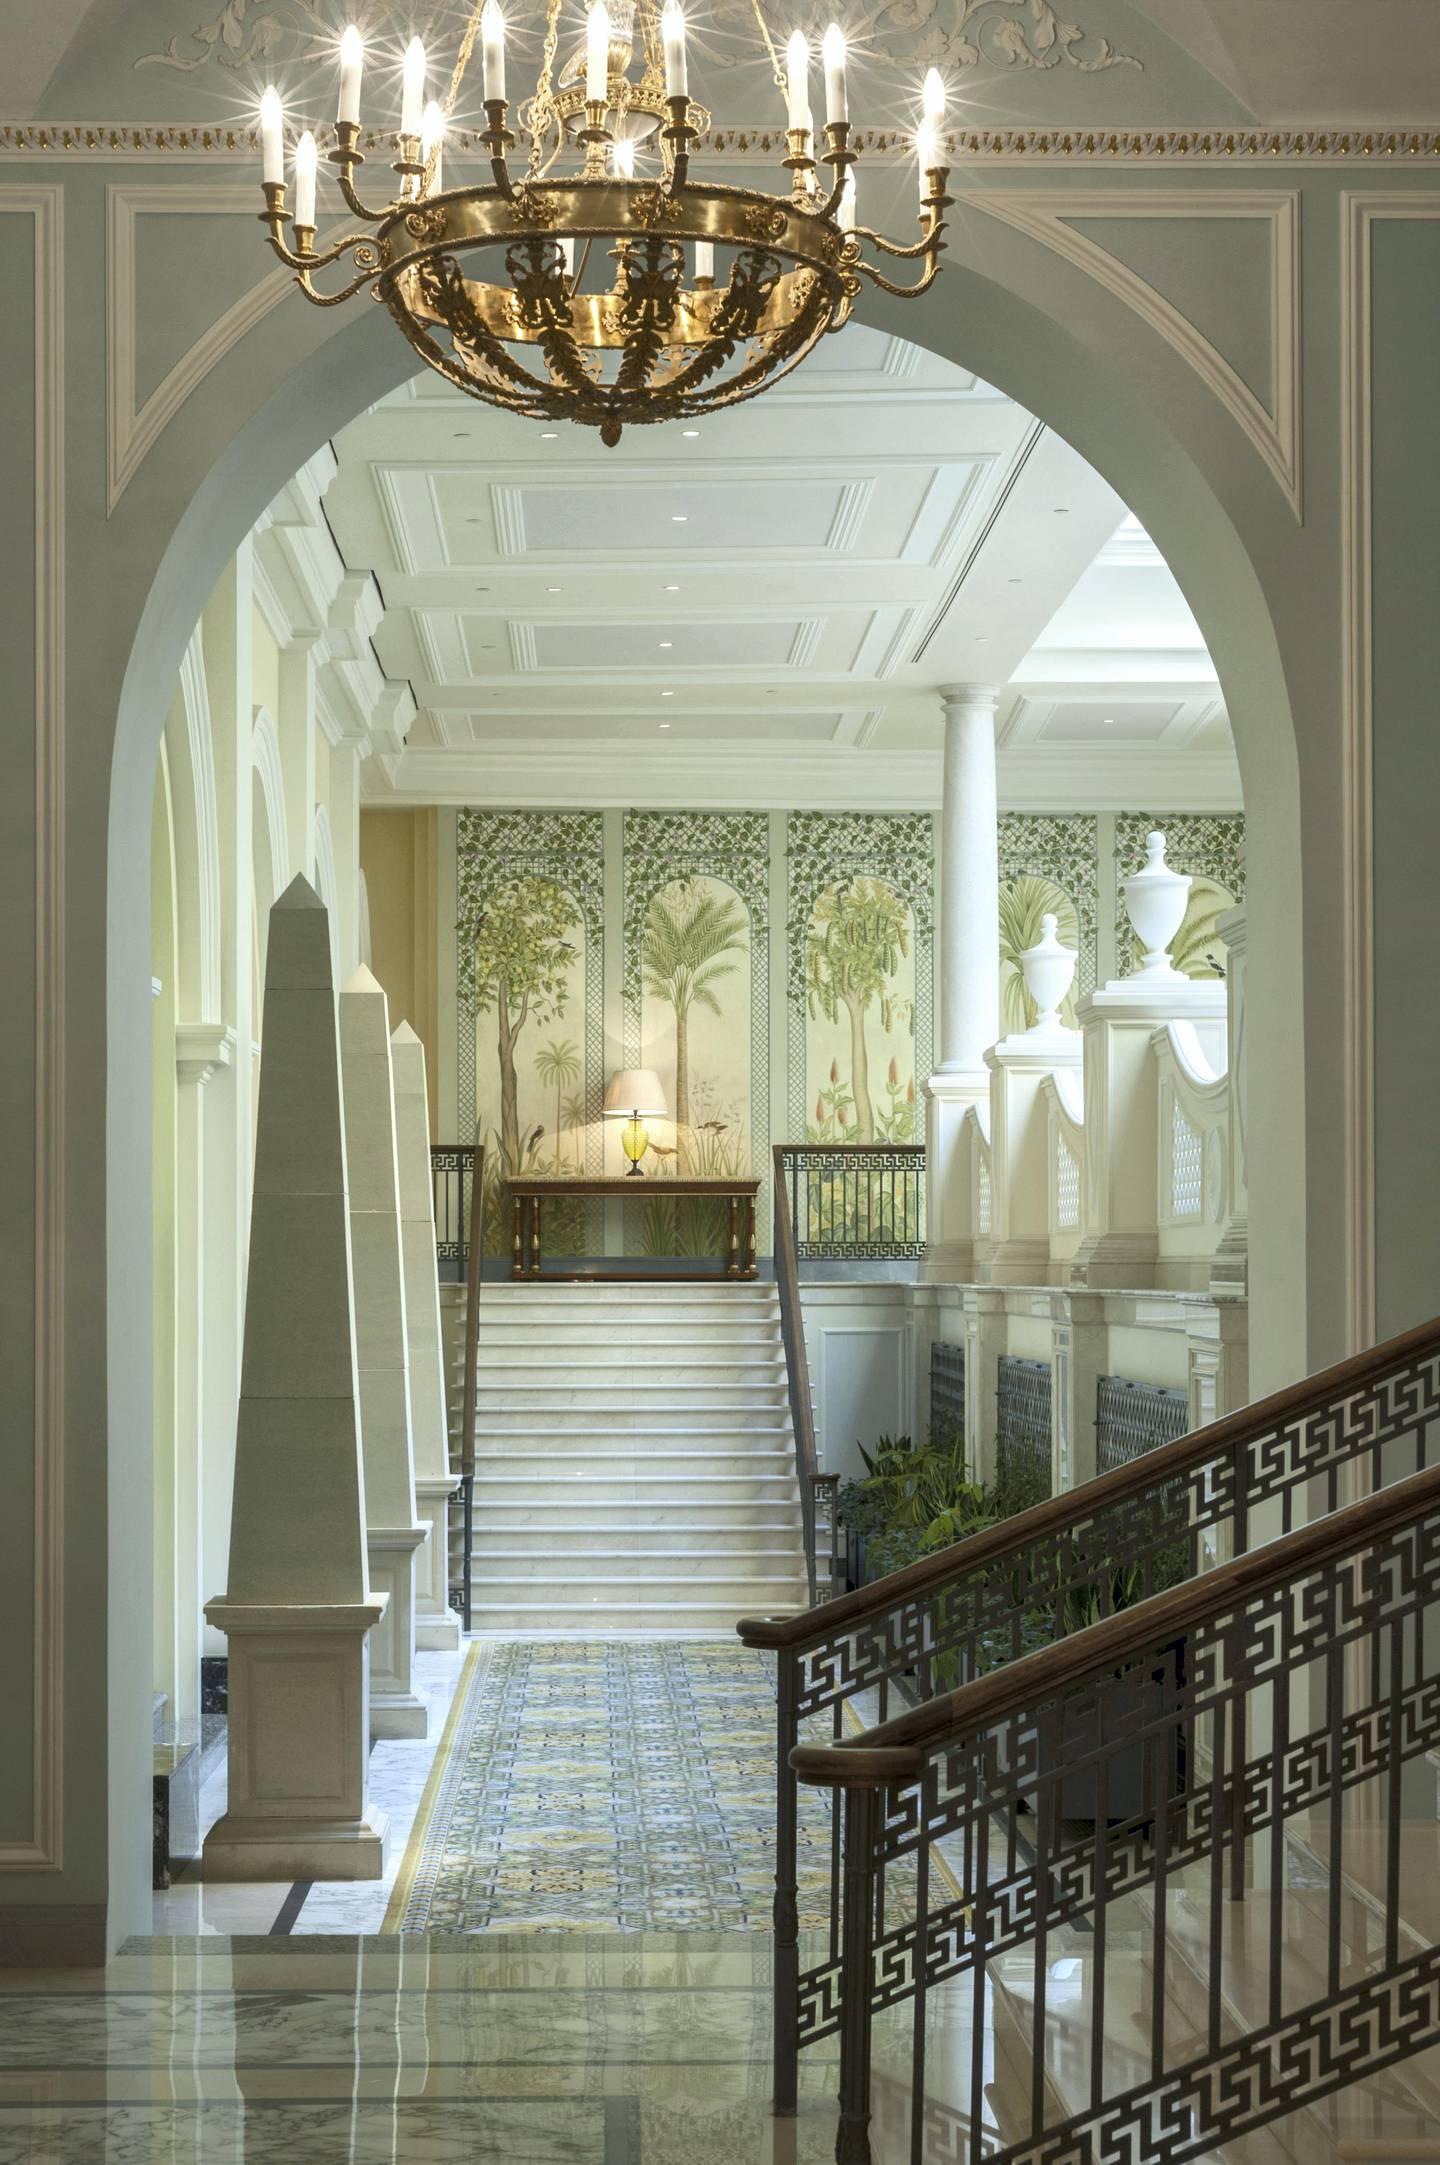 Four Seasons Hotel Lion Palace St. Petersburg. Courtesy Four Seasons Hotel Lion Palace St. Petersburg